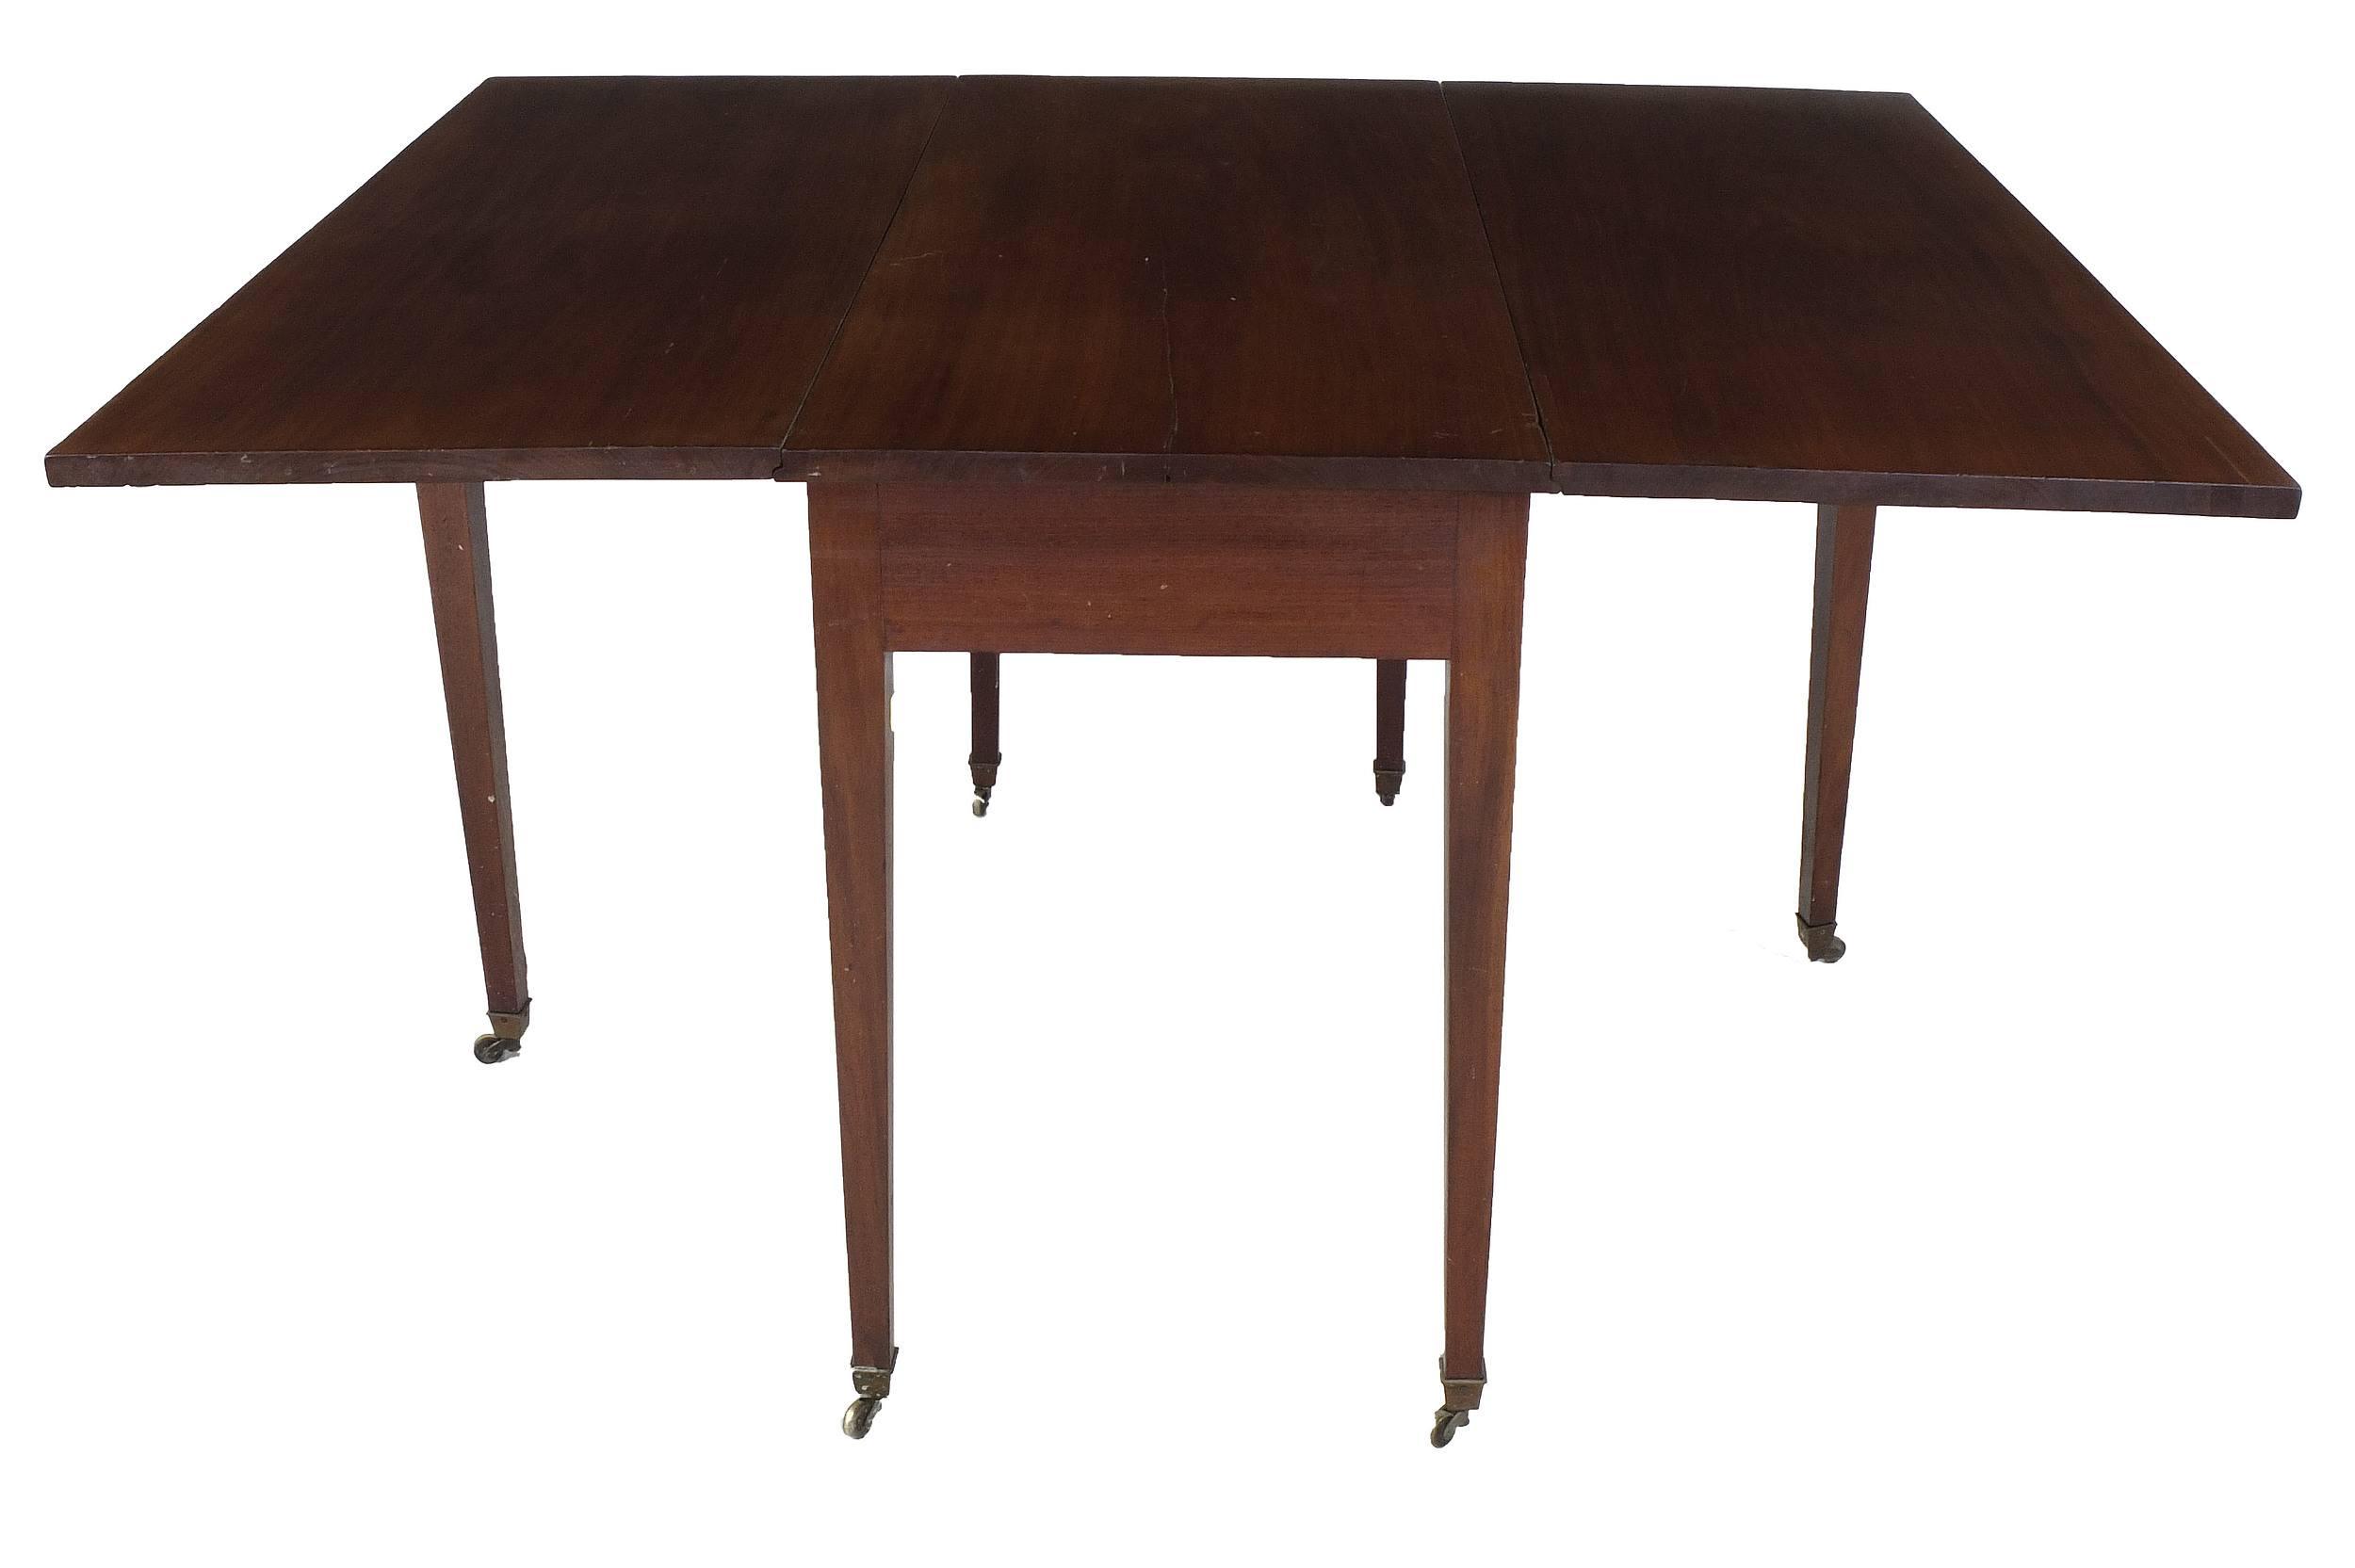 'Georgian Mahogany Dropside Table Circa 1800'